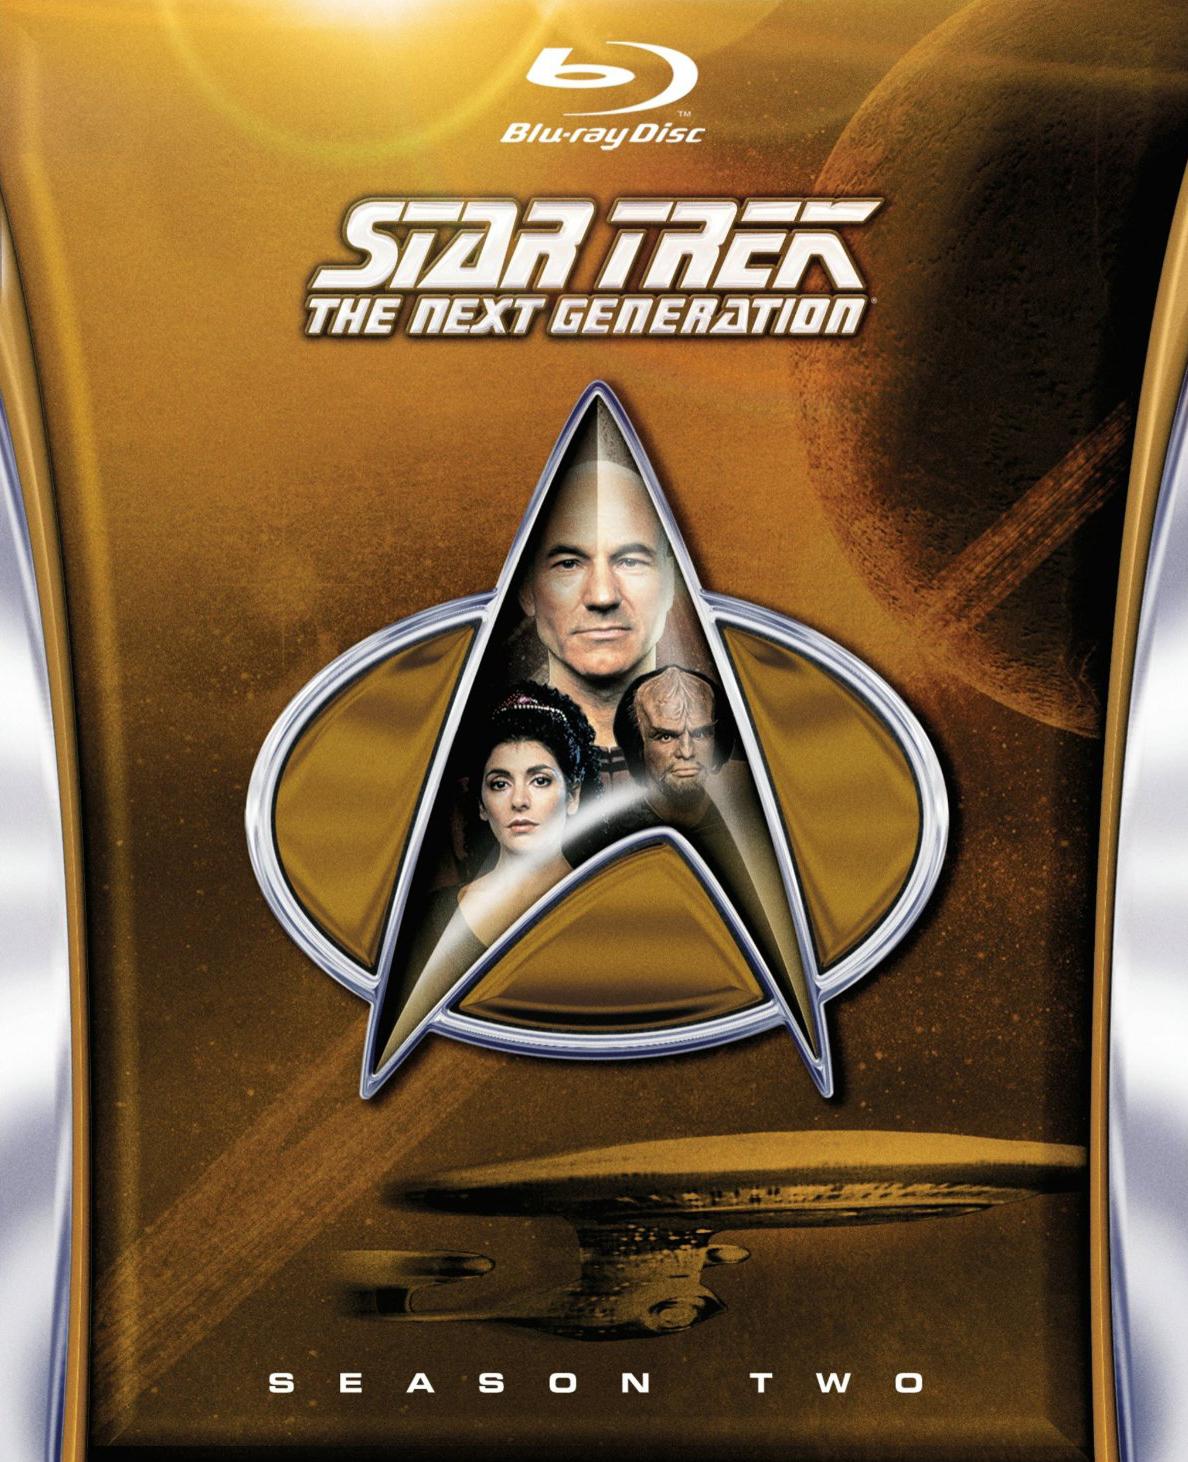 Star trek next generation season 1 blu ray problems / Shining hearts